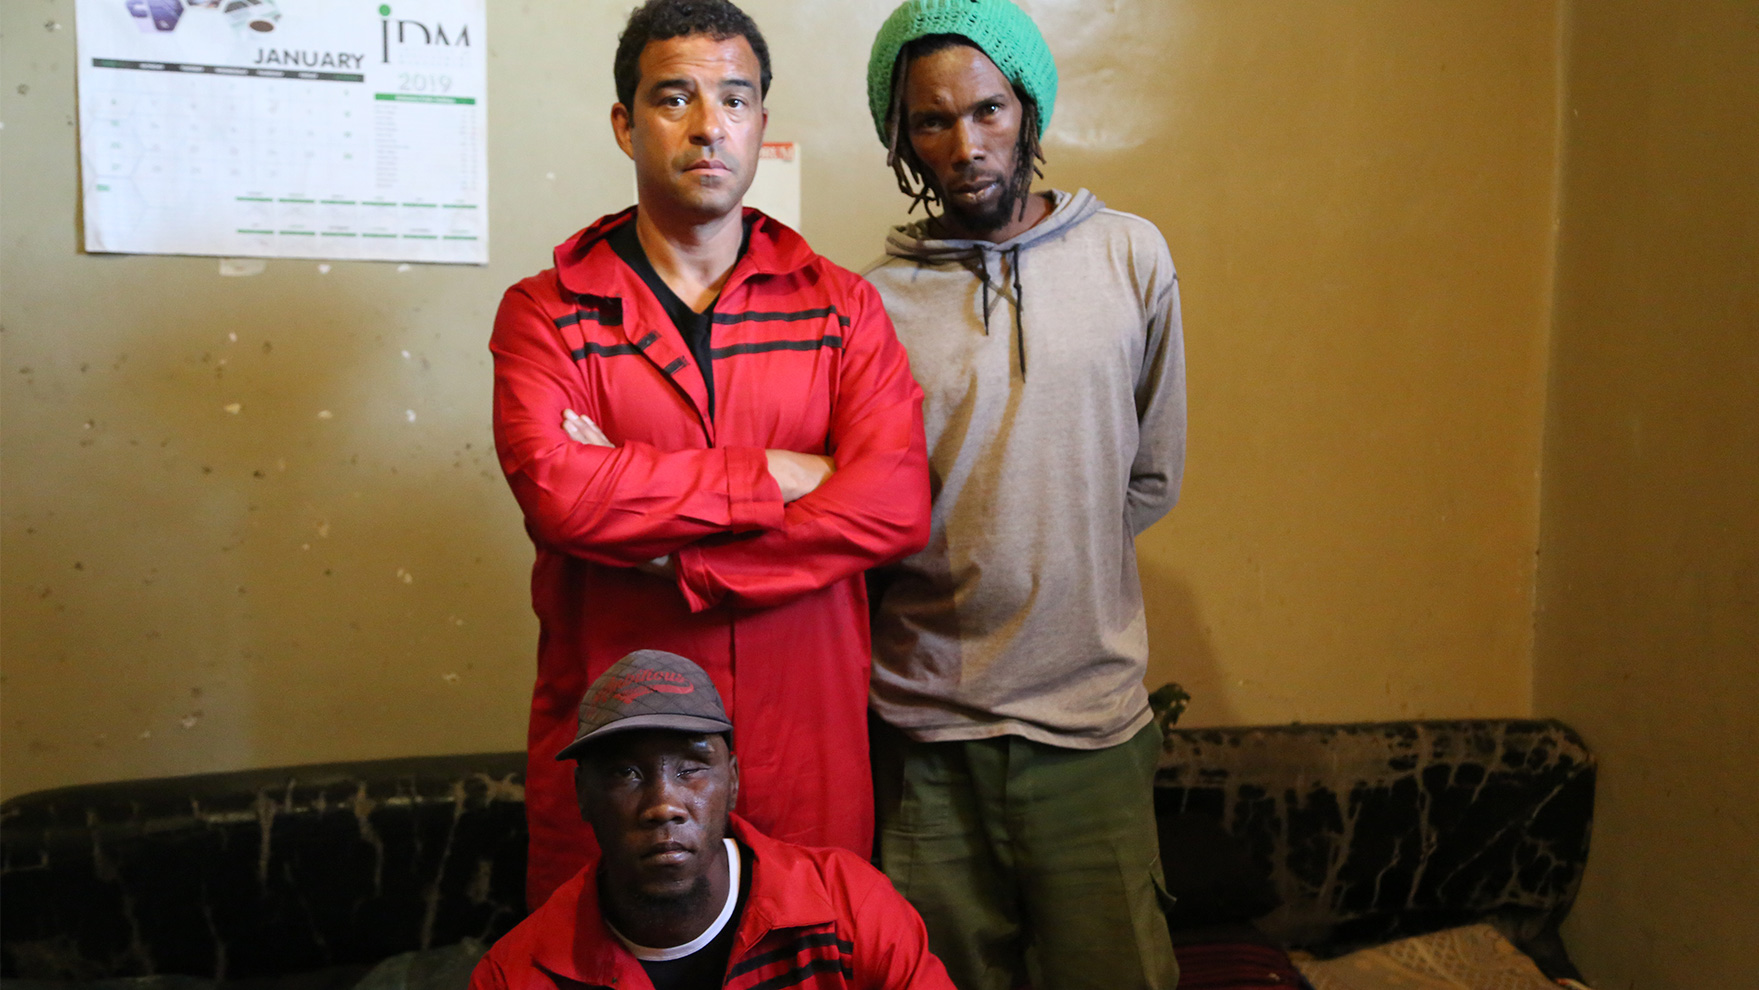 IWTP-404-Lesotho-Publicity-Still-Emporium-19